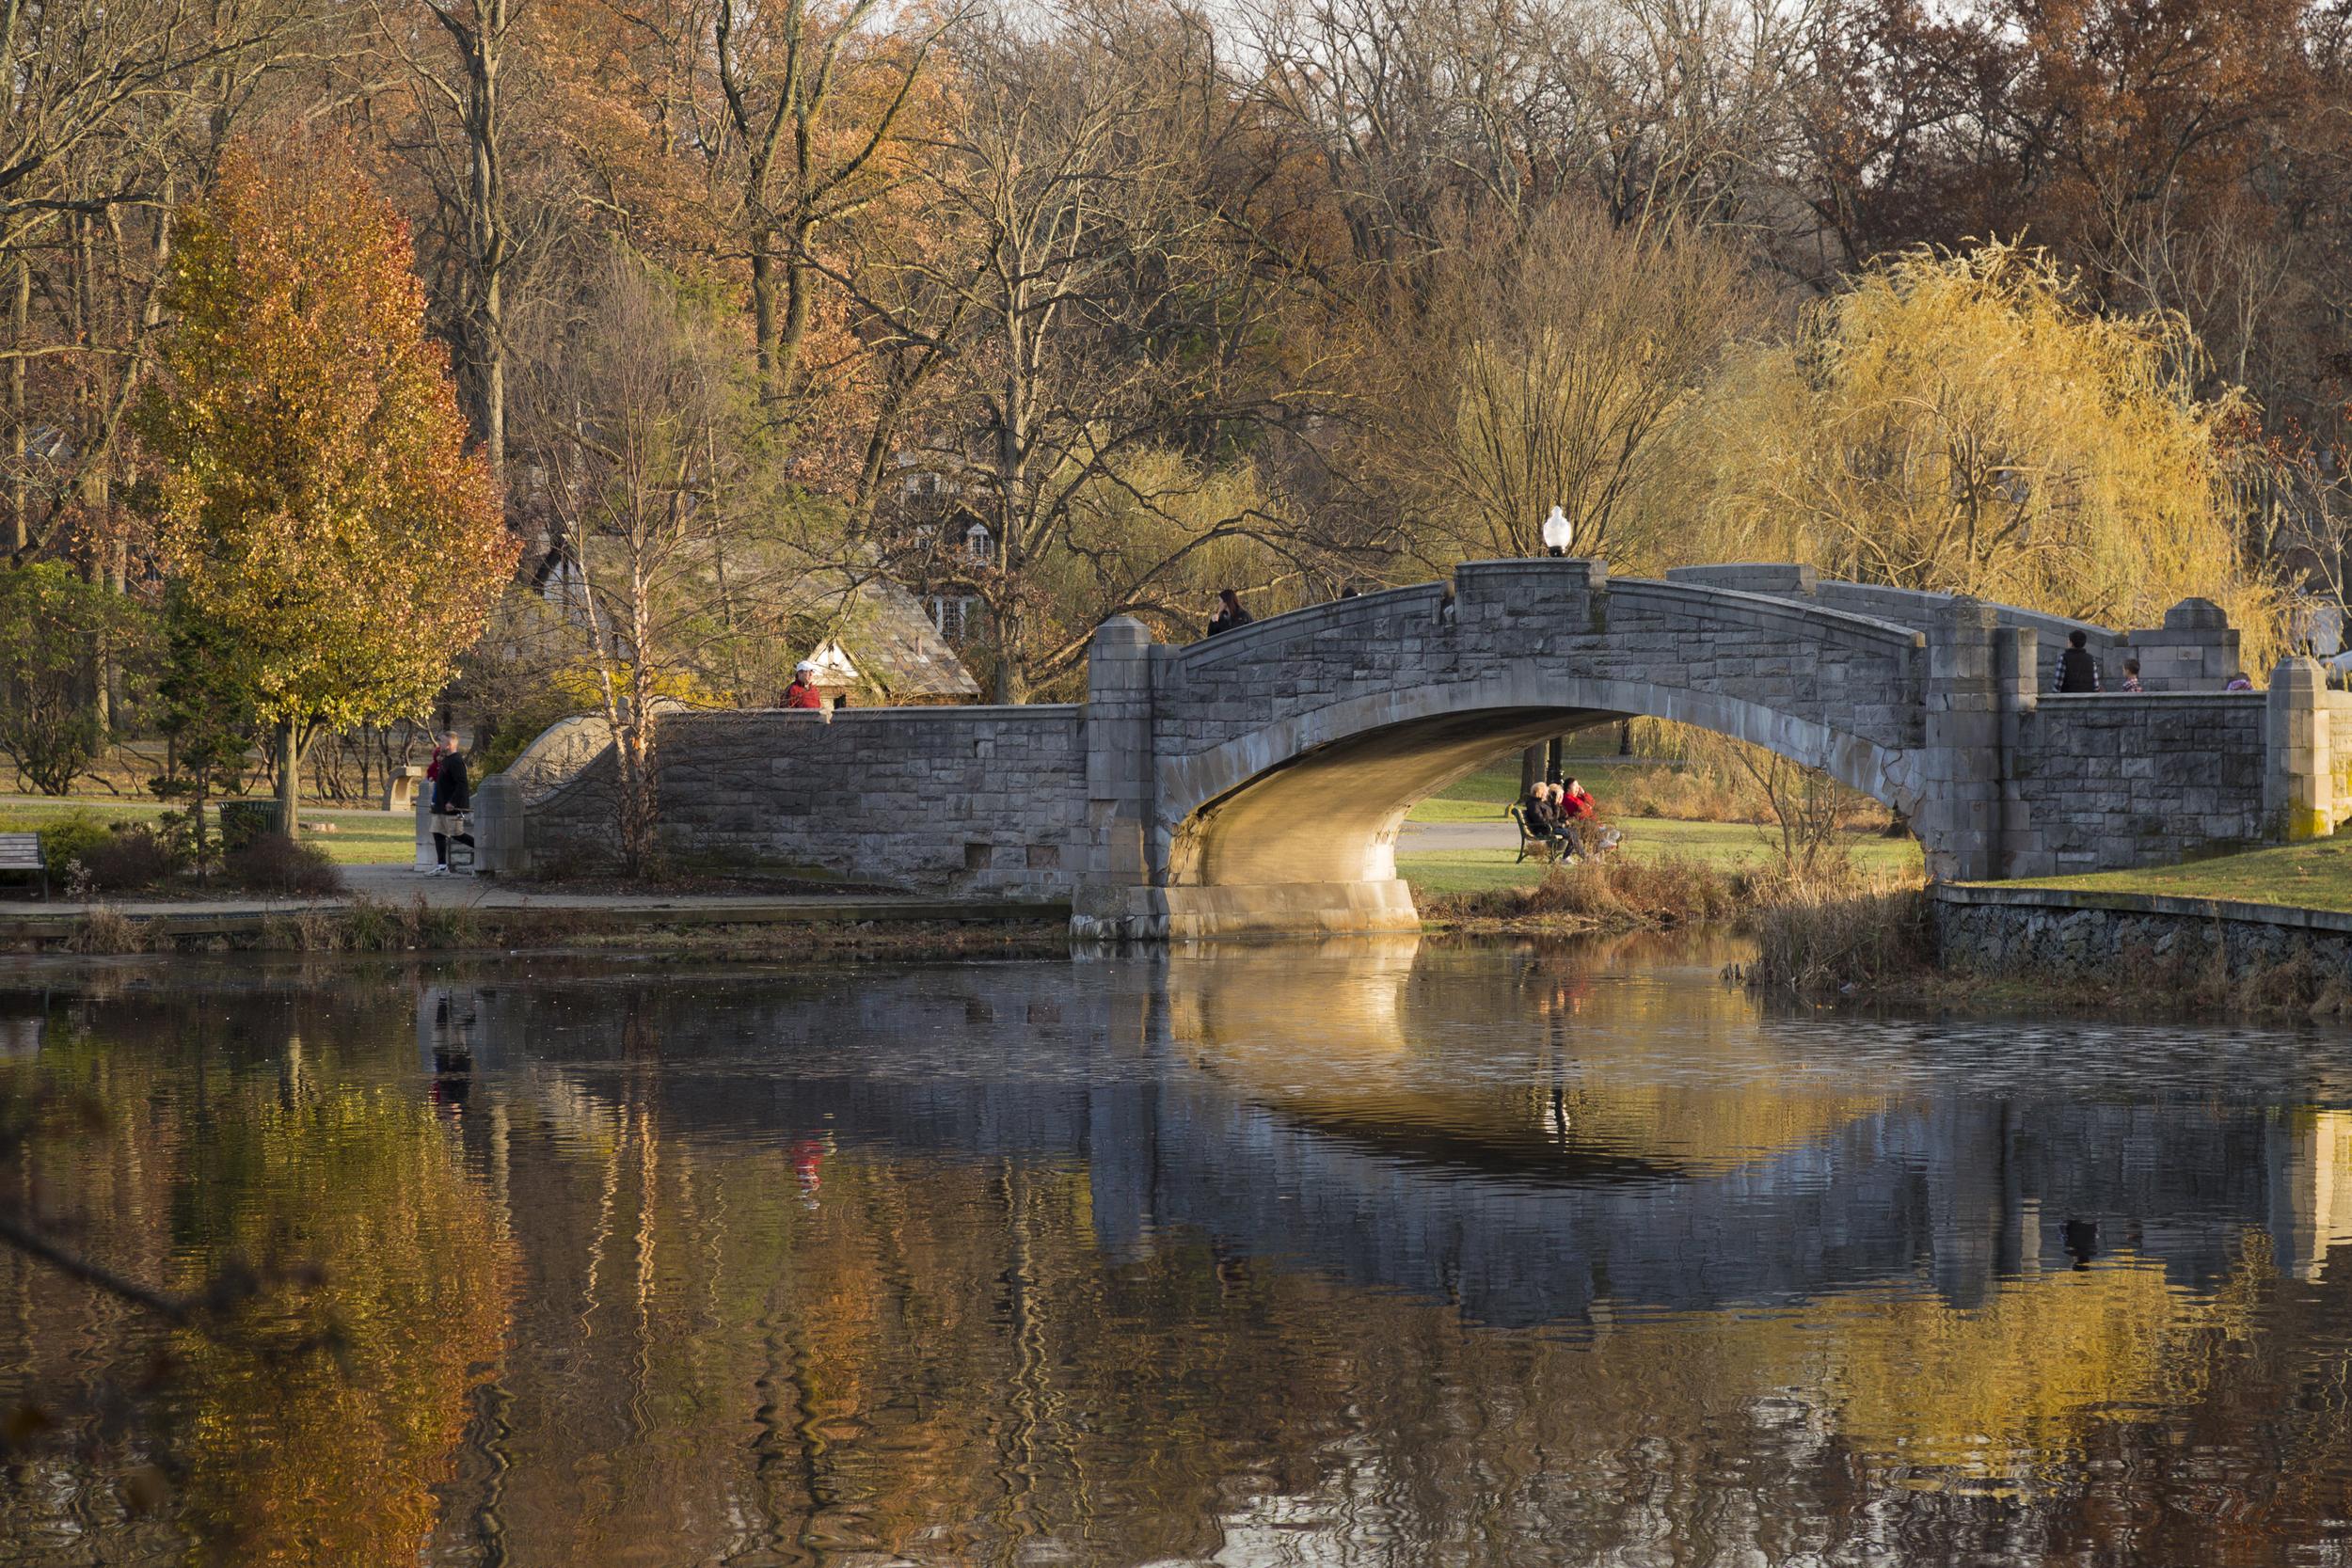 Verona's Bridge